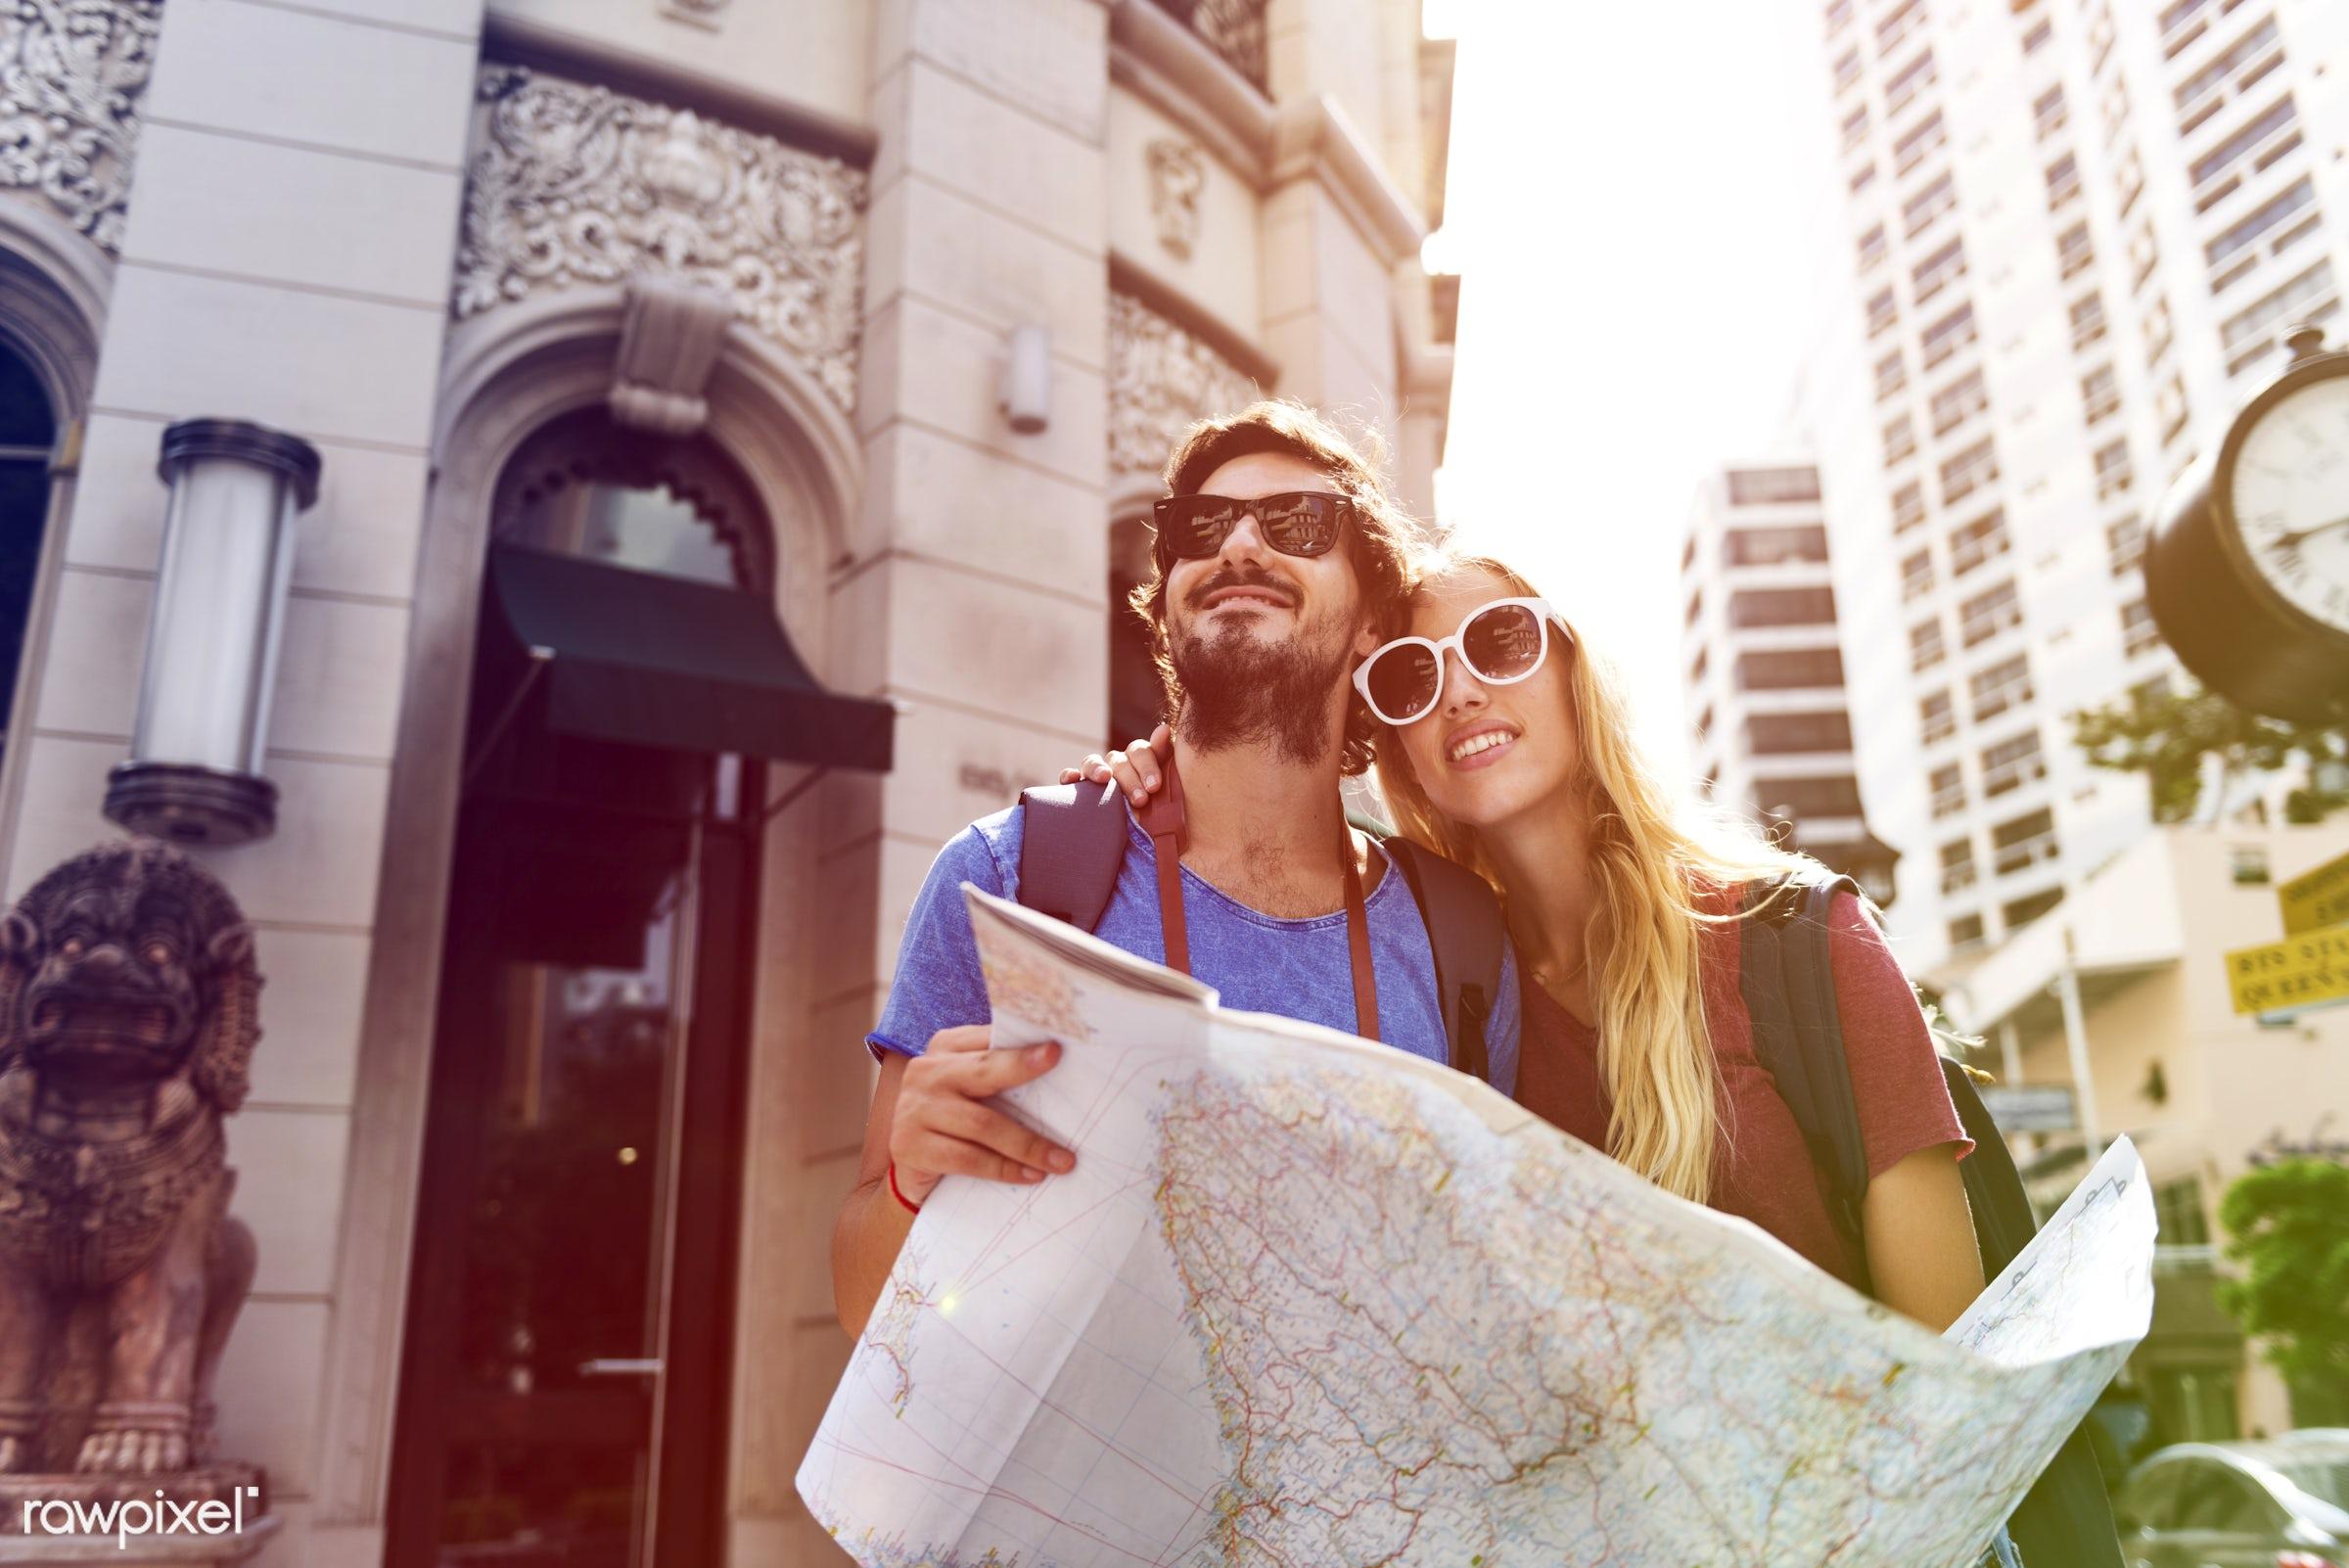 metropolis, backpackers, faded, vibrant, travel, people, together, wanderlust, center, woman, blend, buildings, partner,...